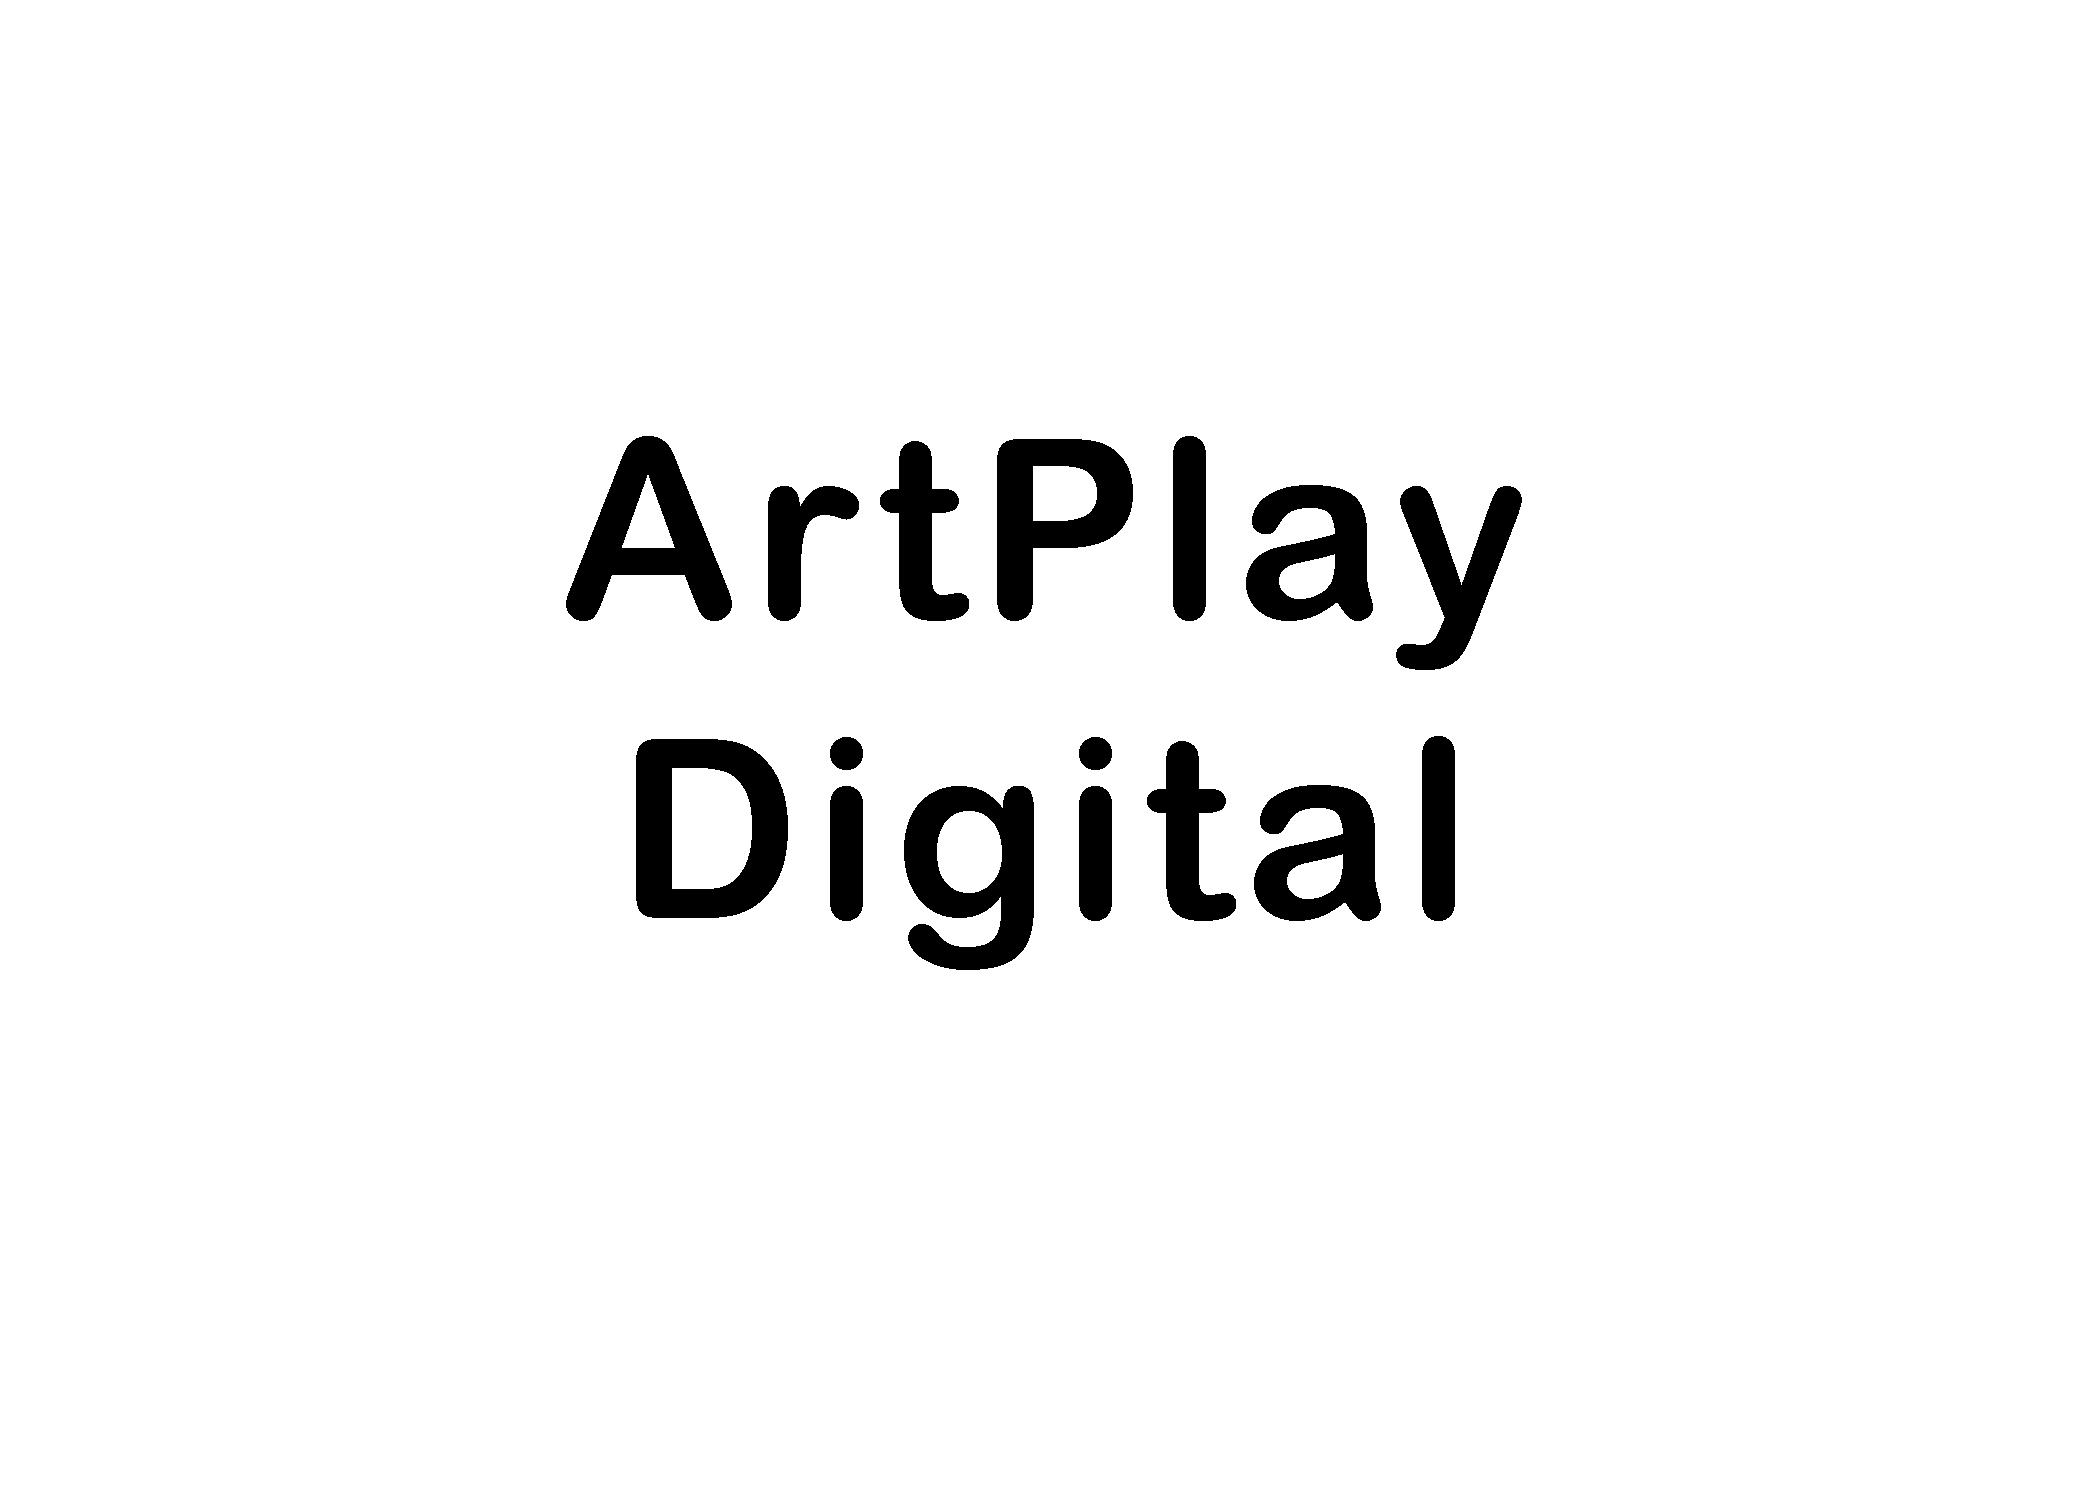 DigitalButton.png